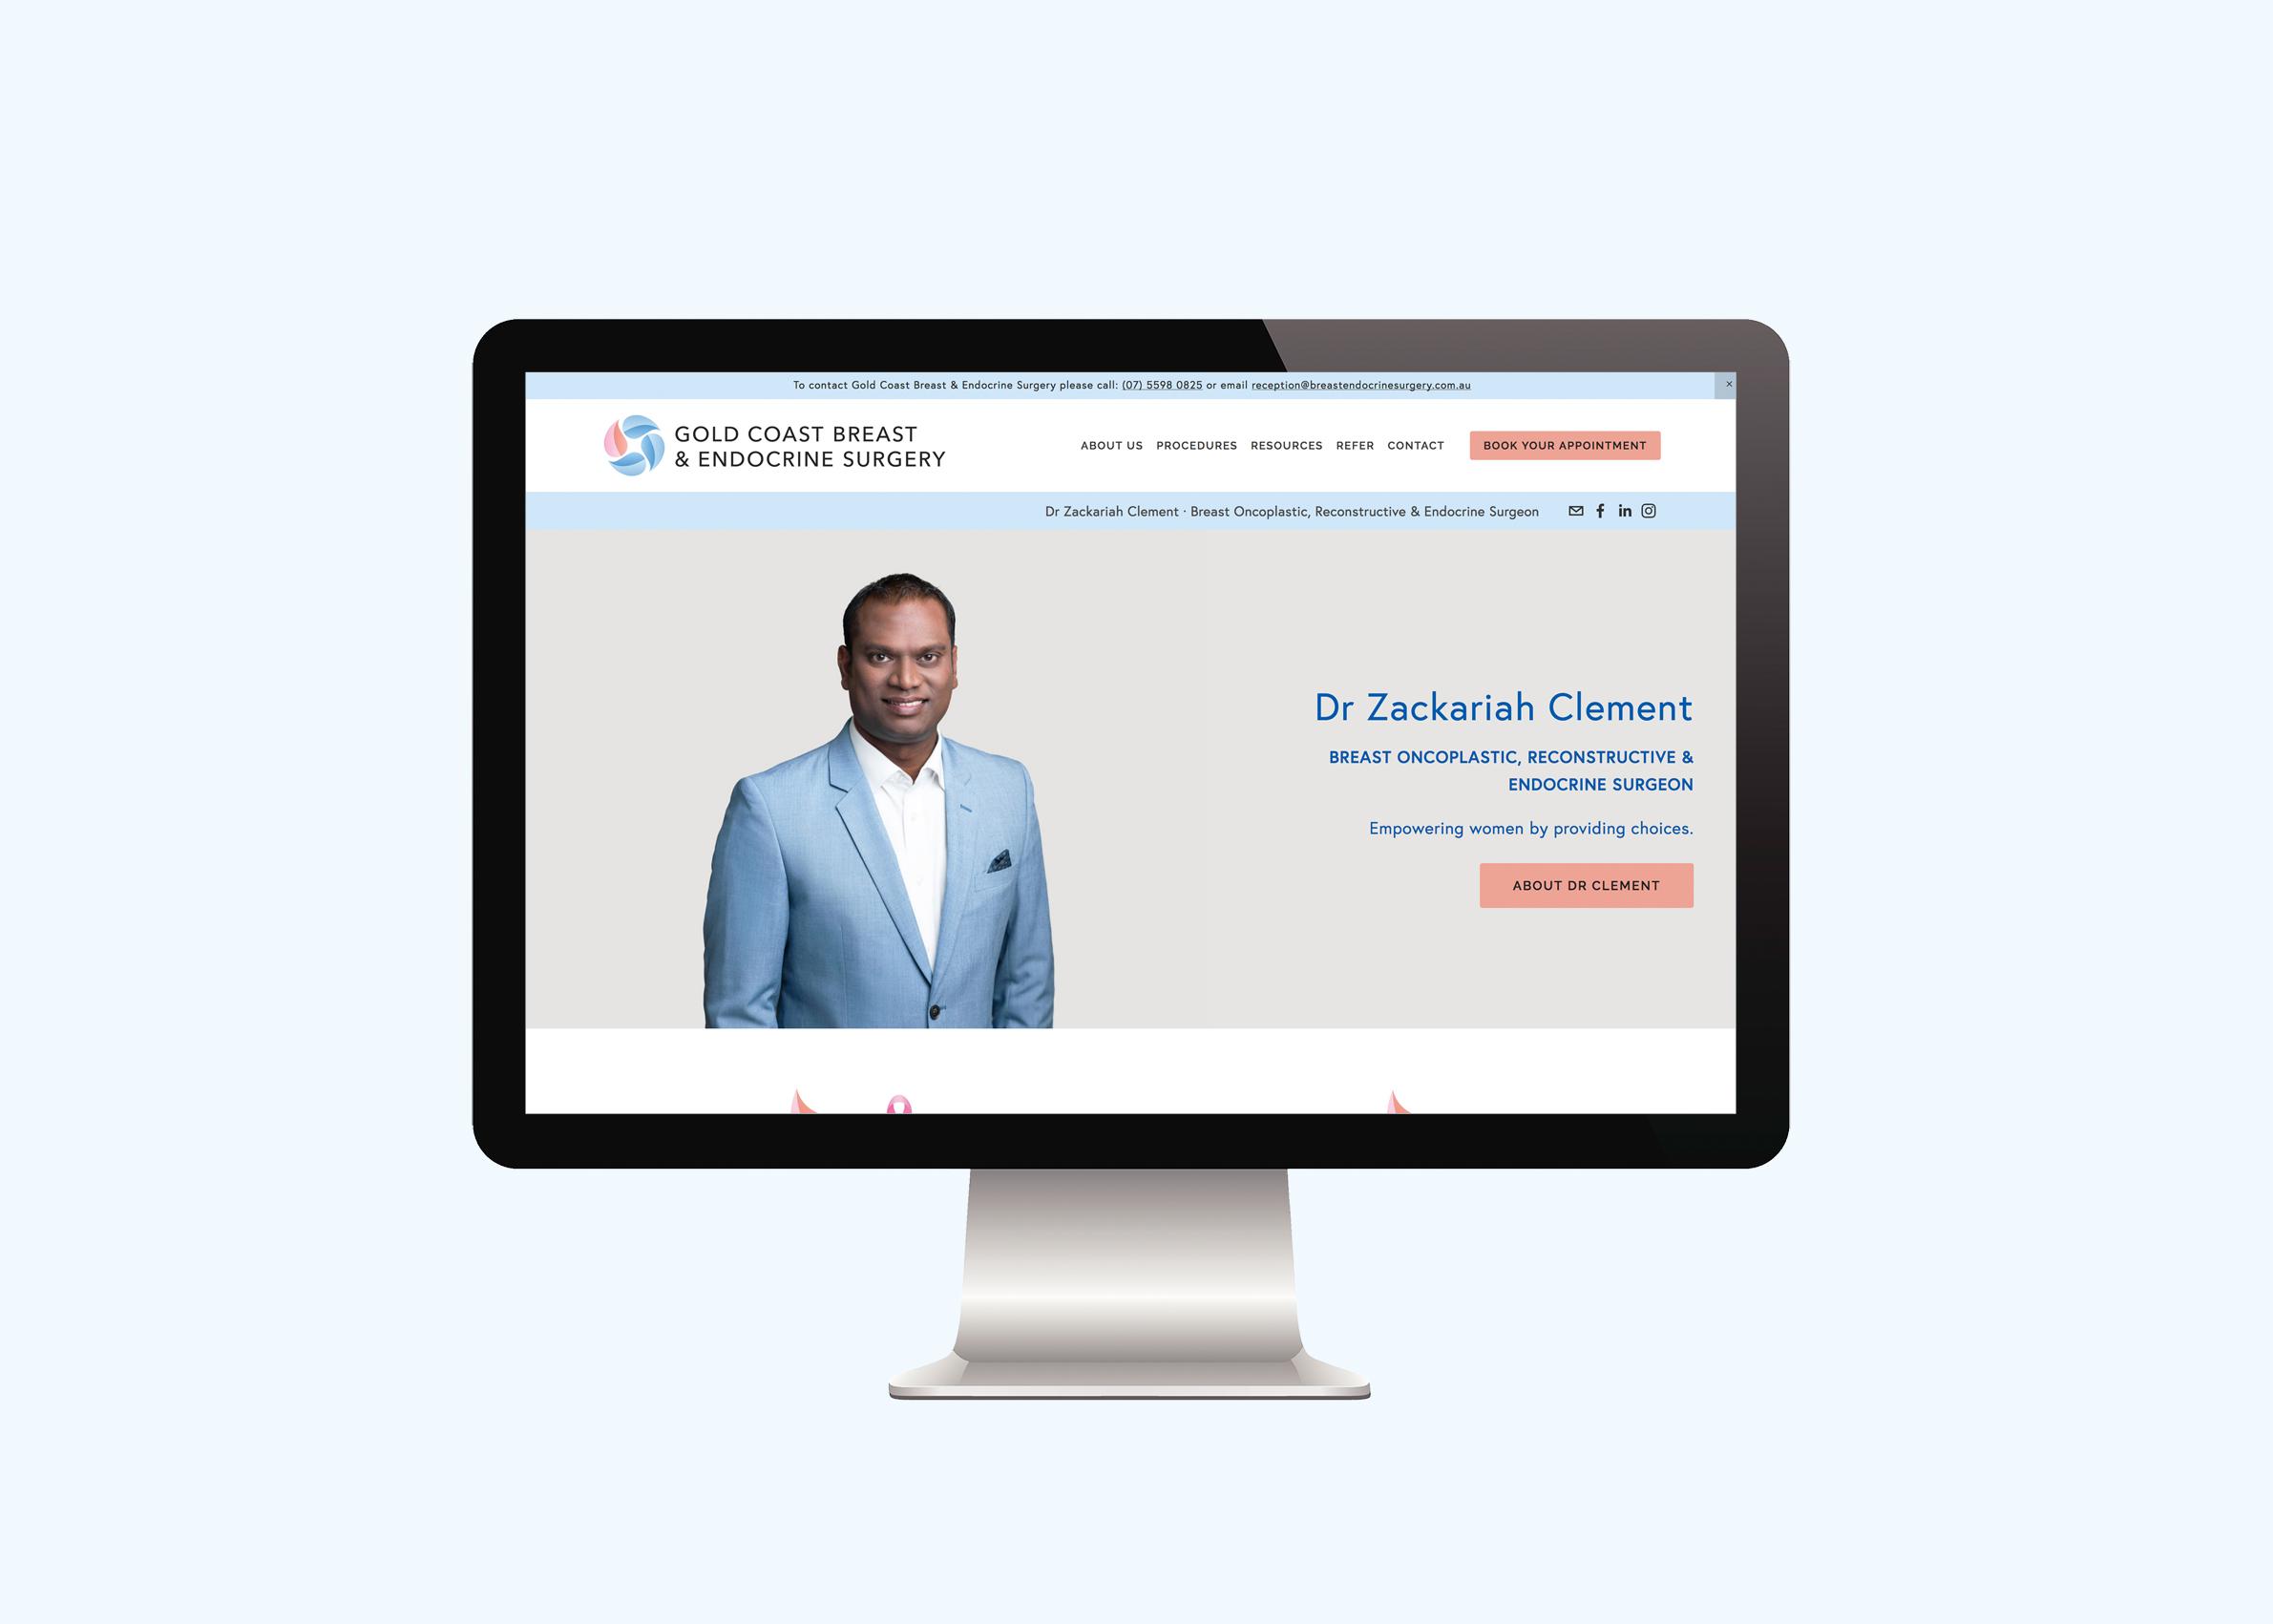 Breast Endocrine Surgeon website designed by Handsome Ground Studio Canberra.